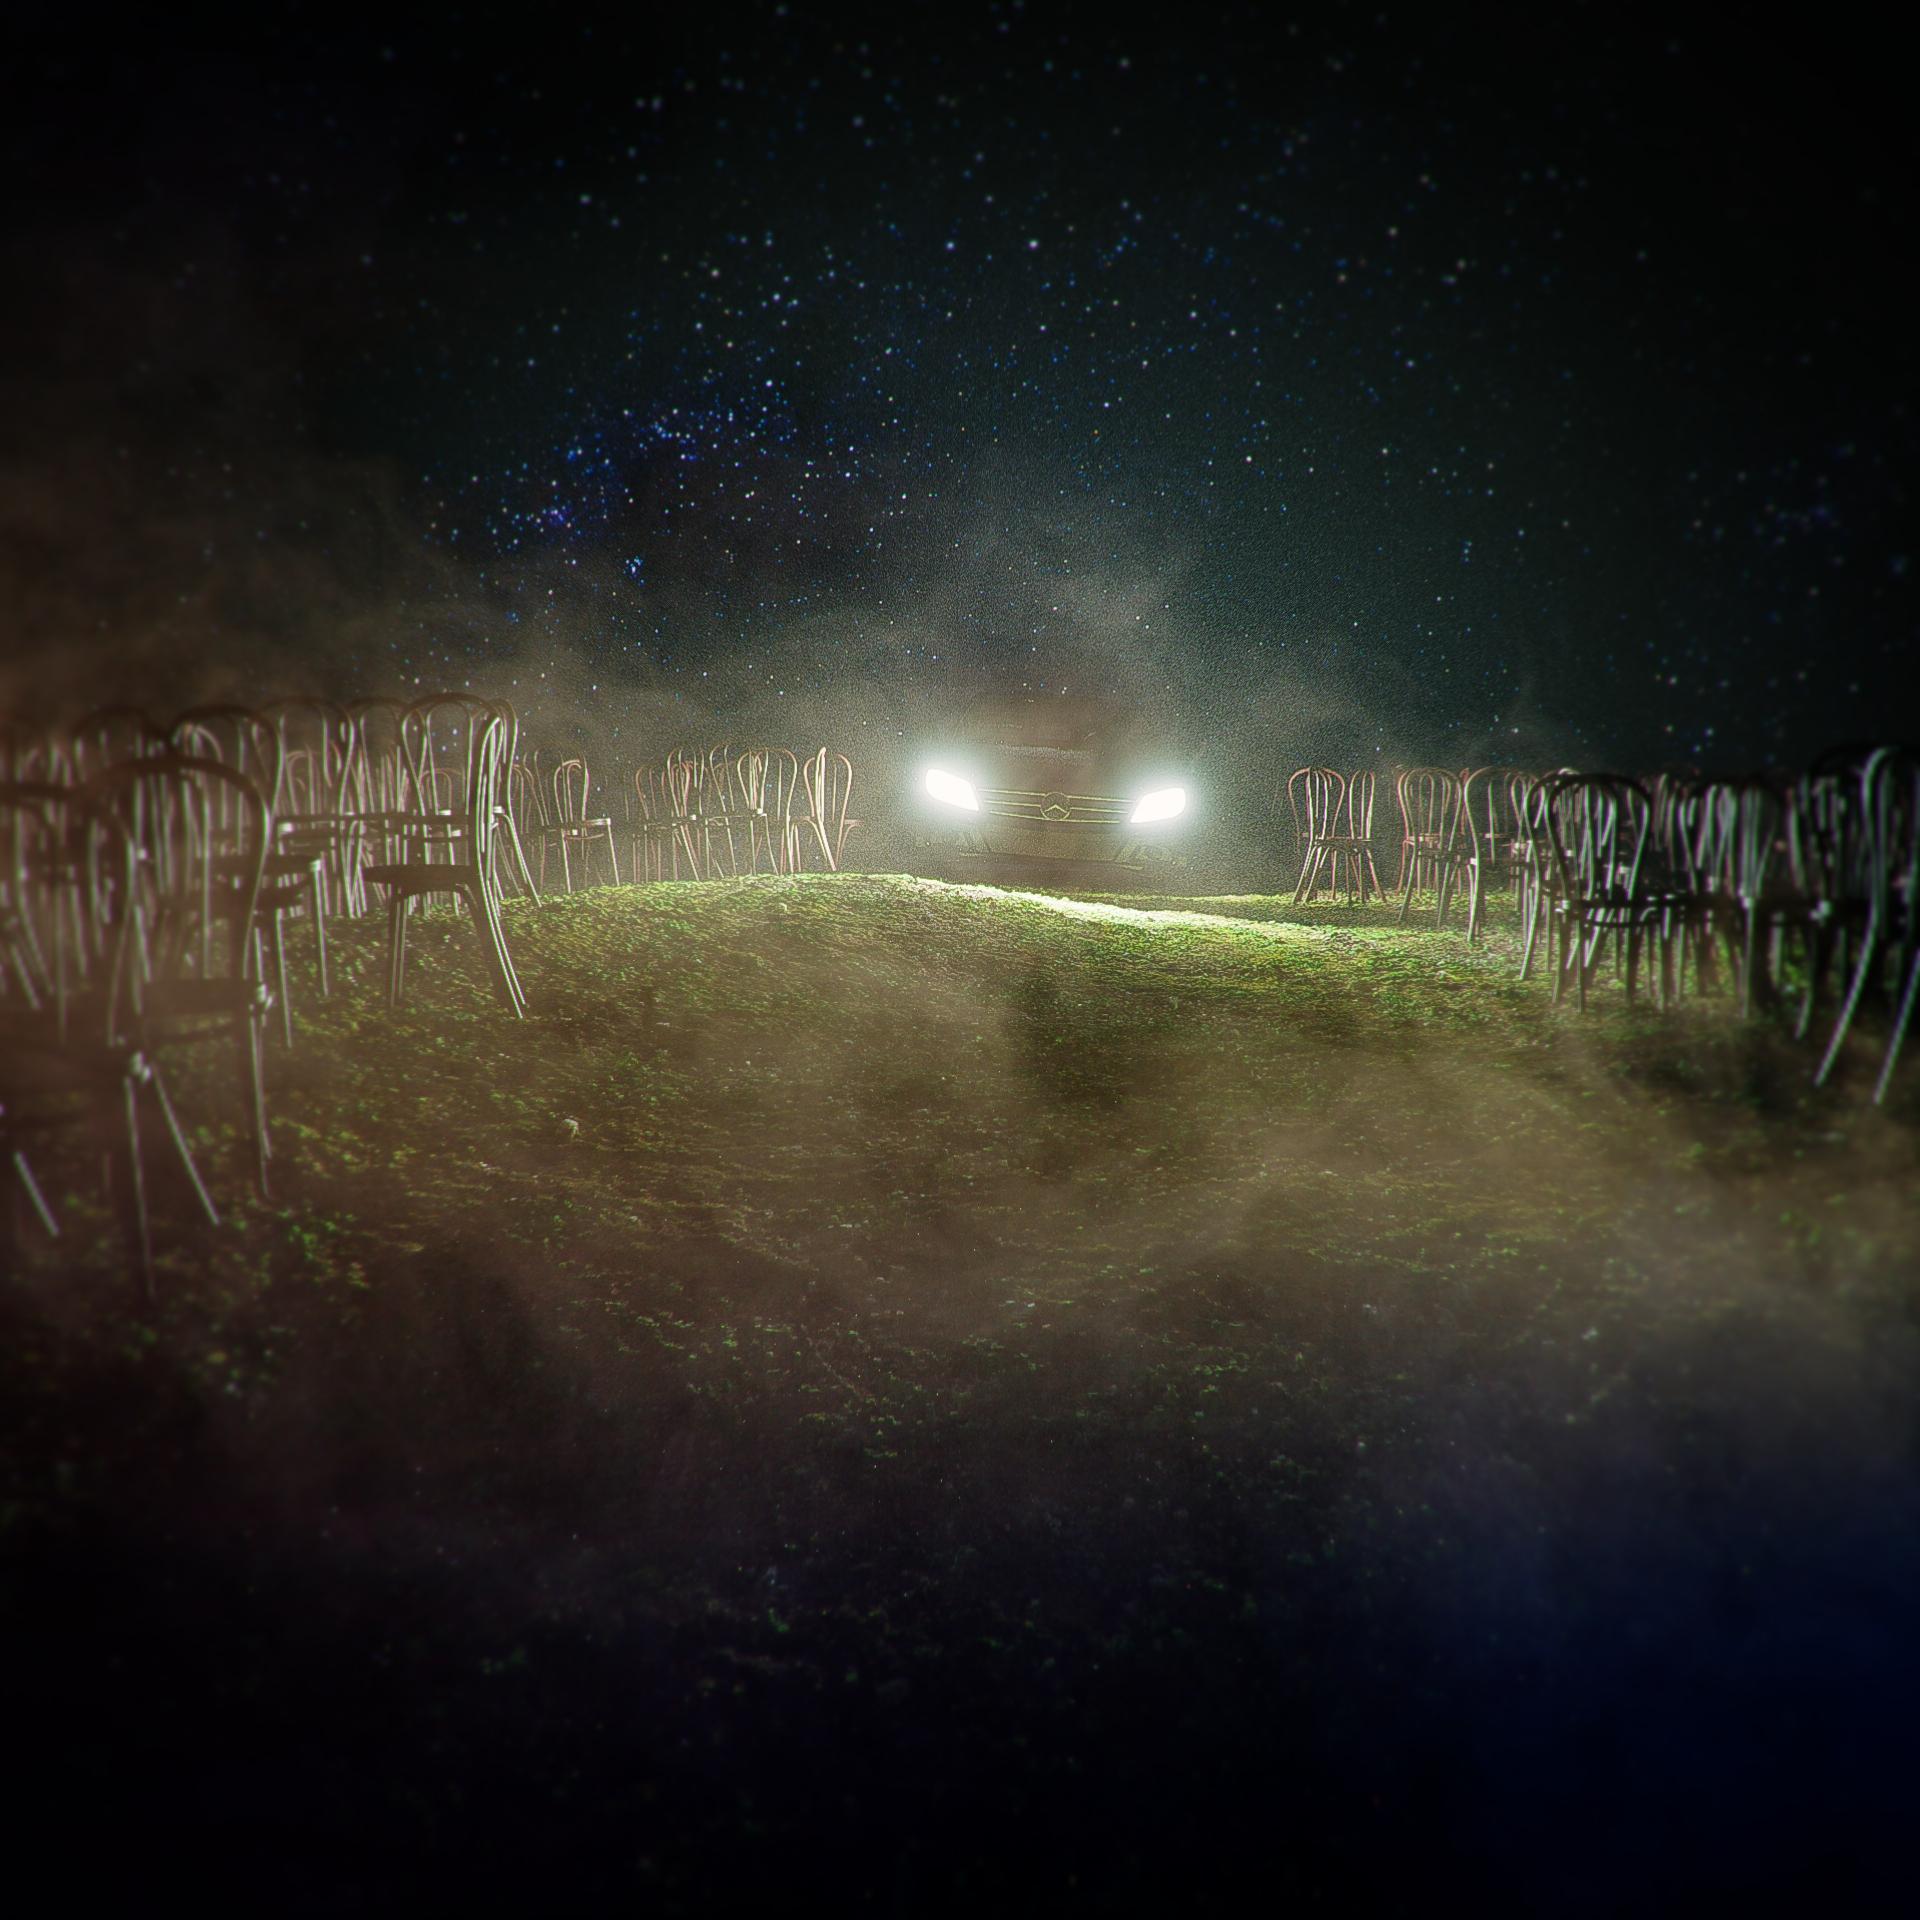 09.13 Octane Render. More fog/atmosphere research.